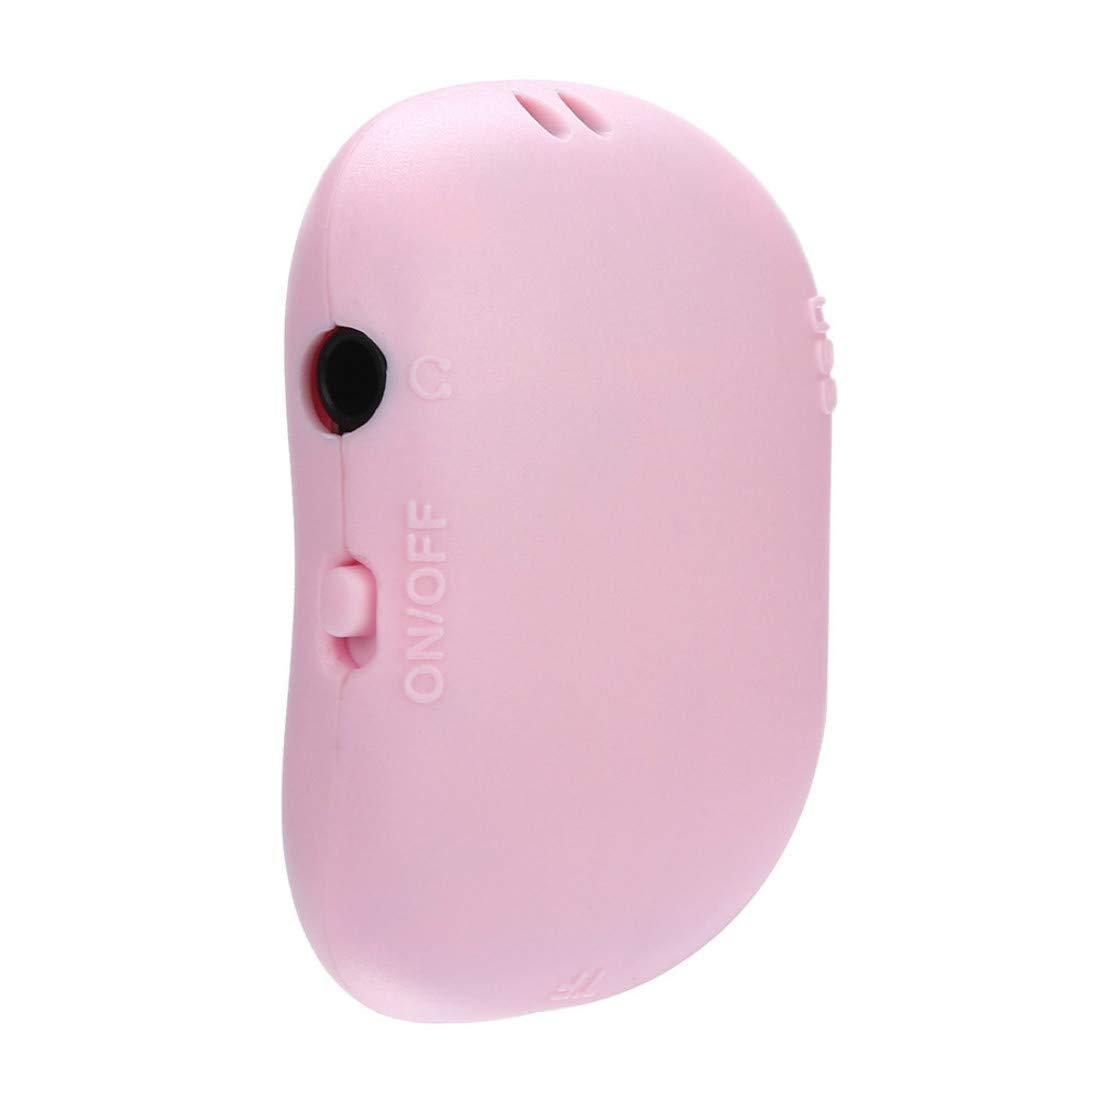 PCEPEIVK Portable Mini USB MP3 Player Support Micro SD TF Card 32GB Sport Music Media Walkman by PCEPEIVK (Image #2)